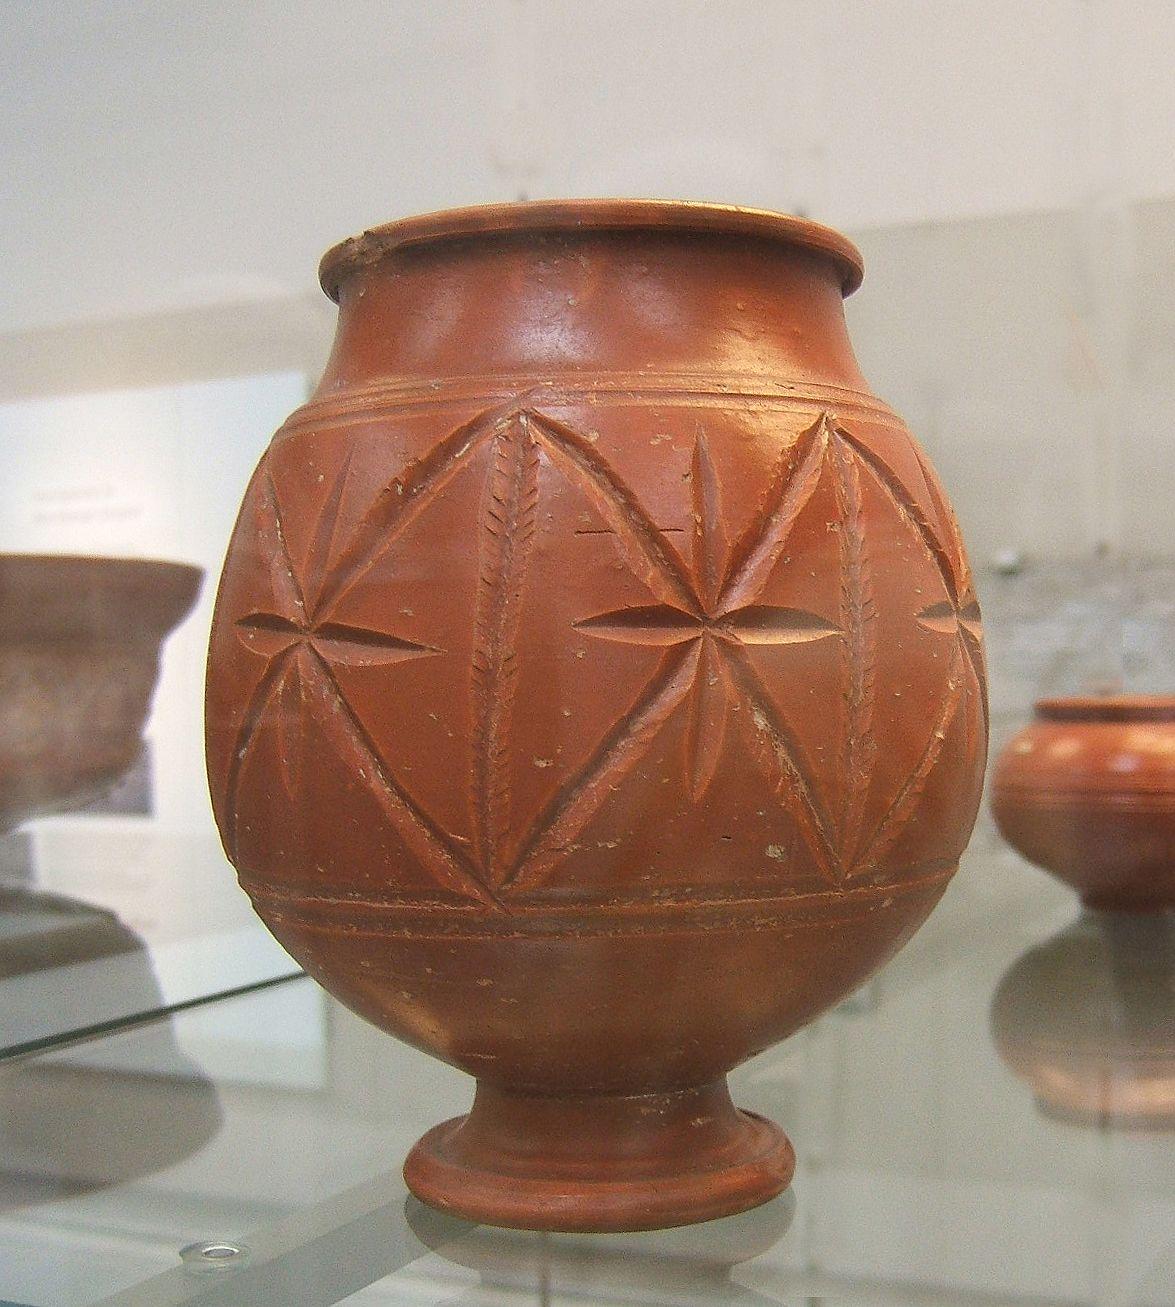 Terra sigillata wikipedia the free encyclopedia pottery roman pottery central gaulish samian jar ancient roman pottery wikipedia the free encyclopedia floridaeventfo Gallery